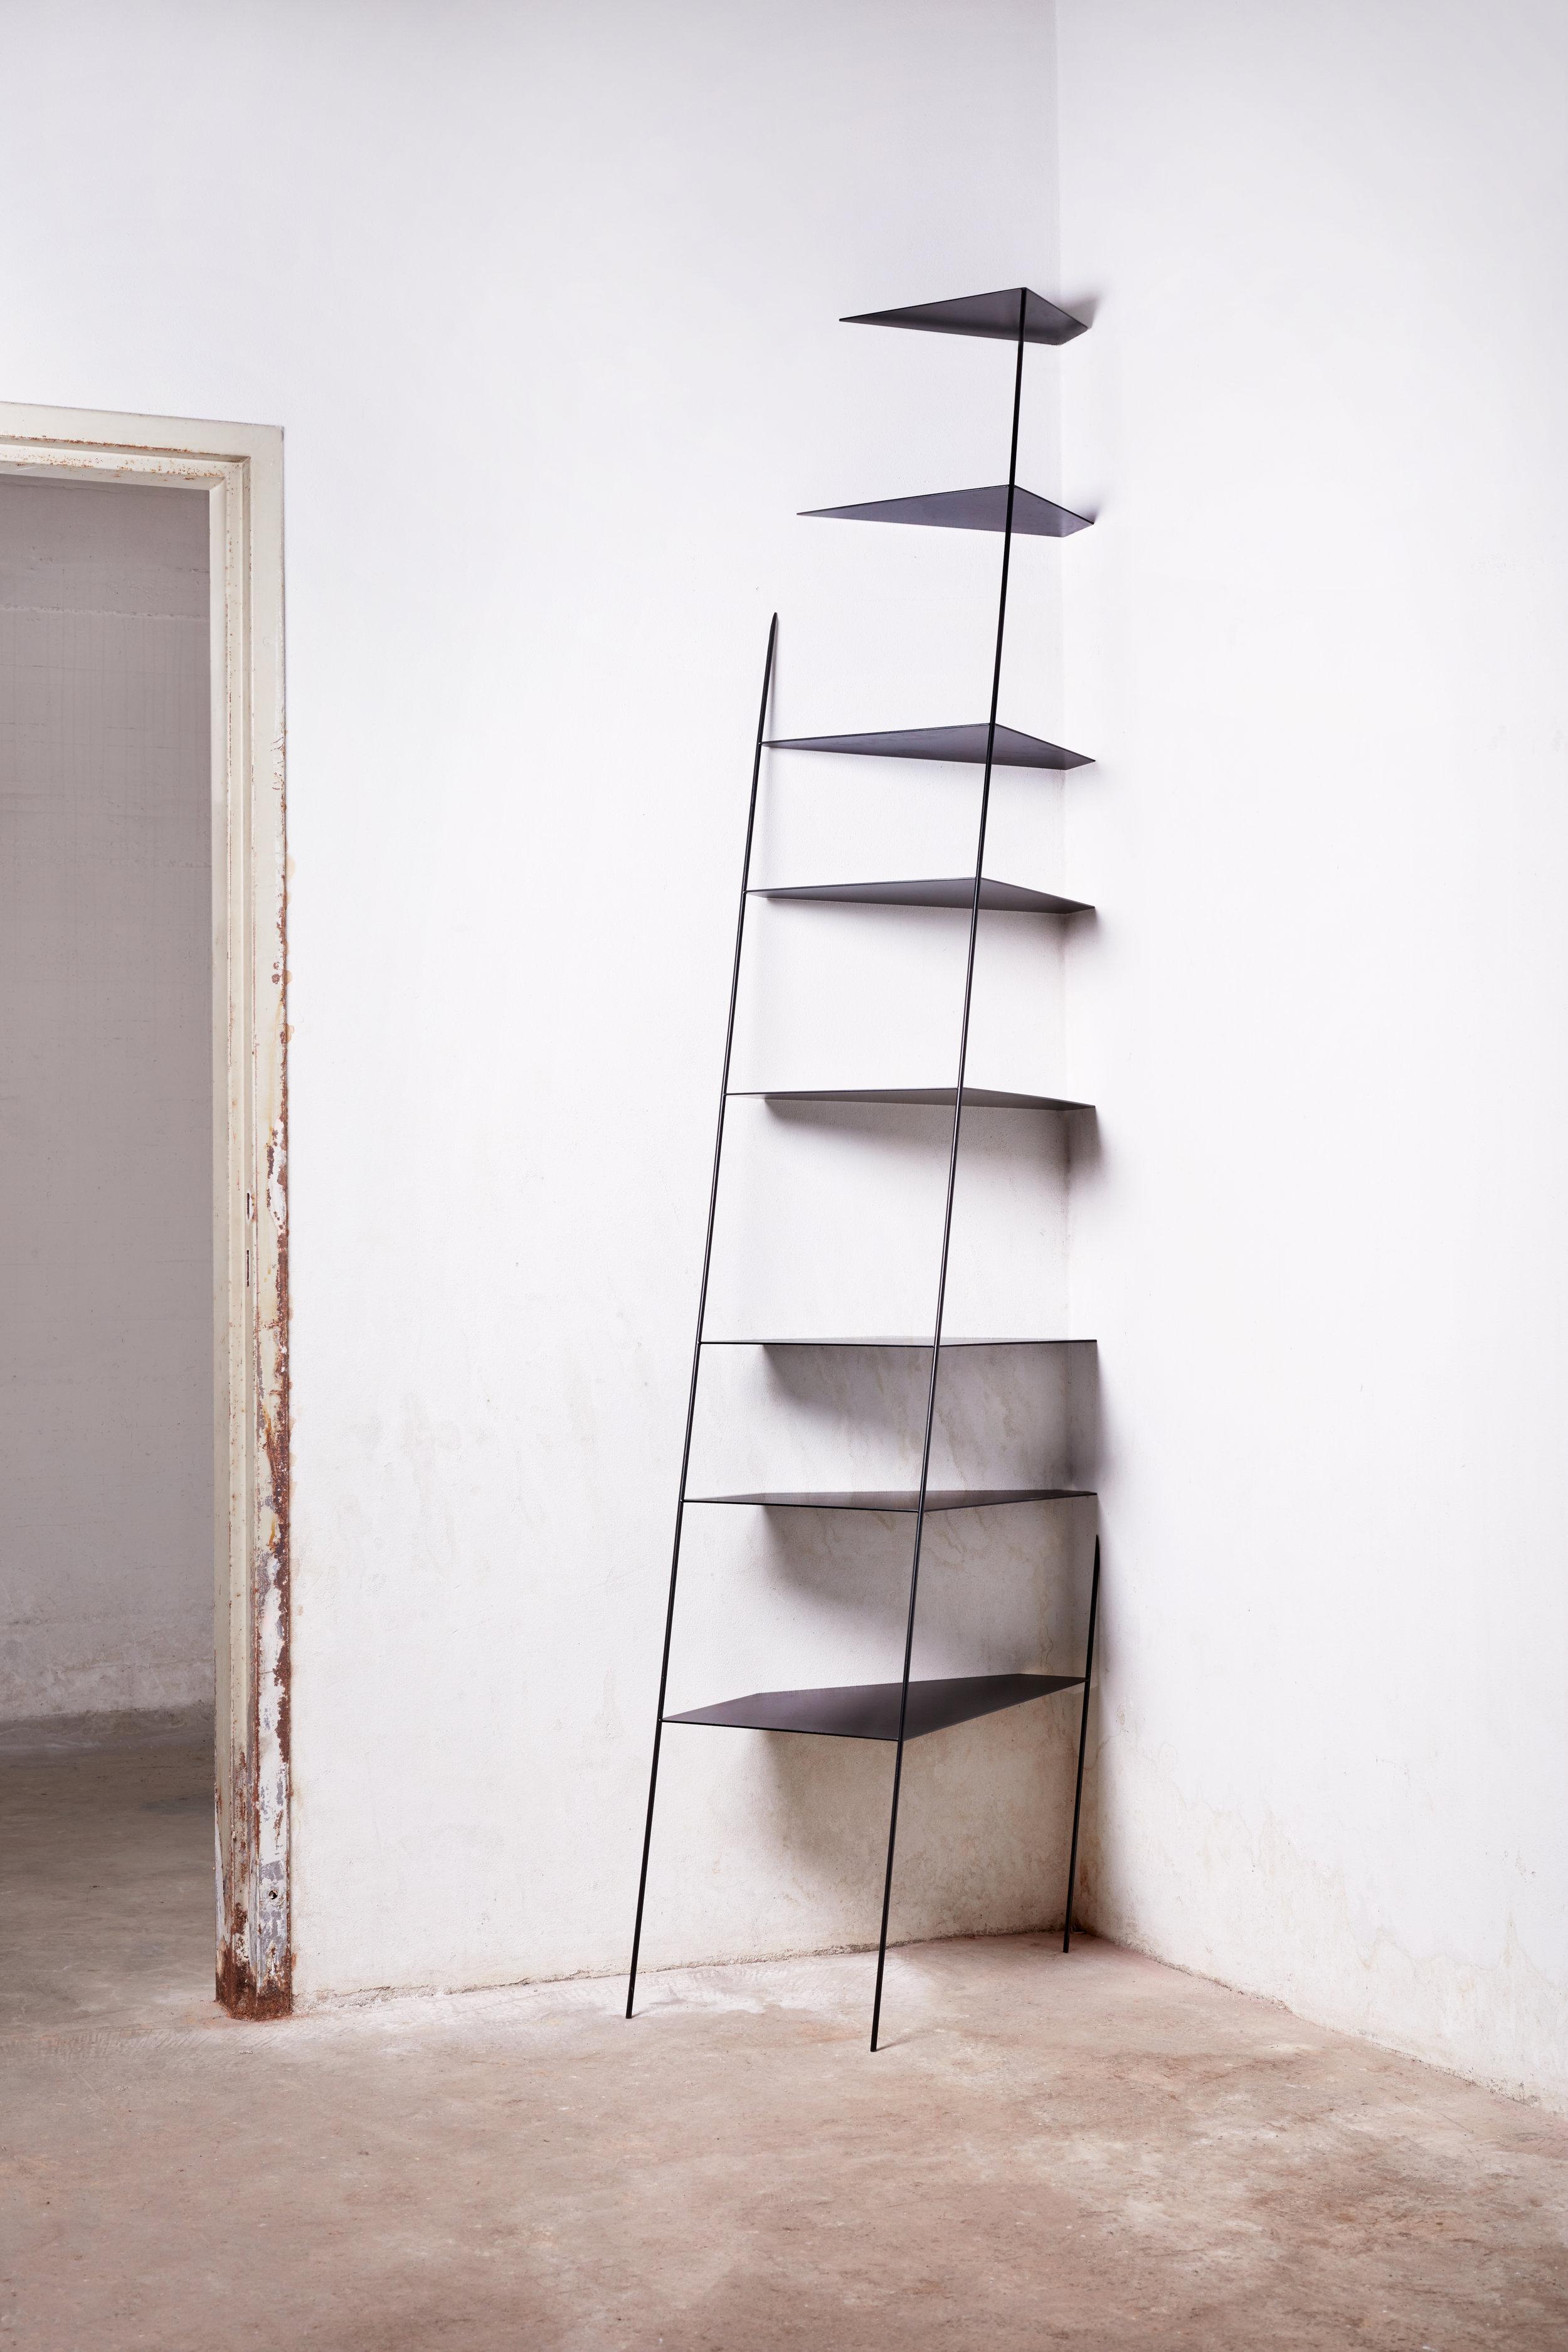 Big Leaning Shelf-Marija_Đondović-2.jpg